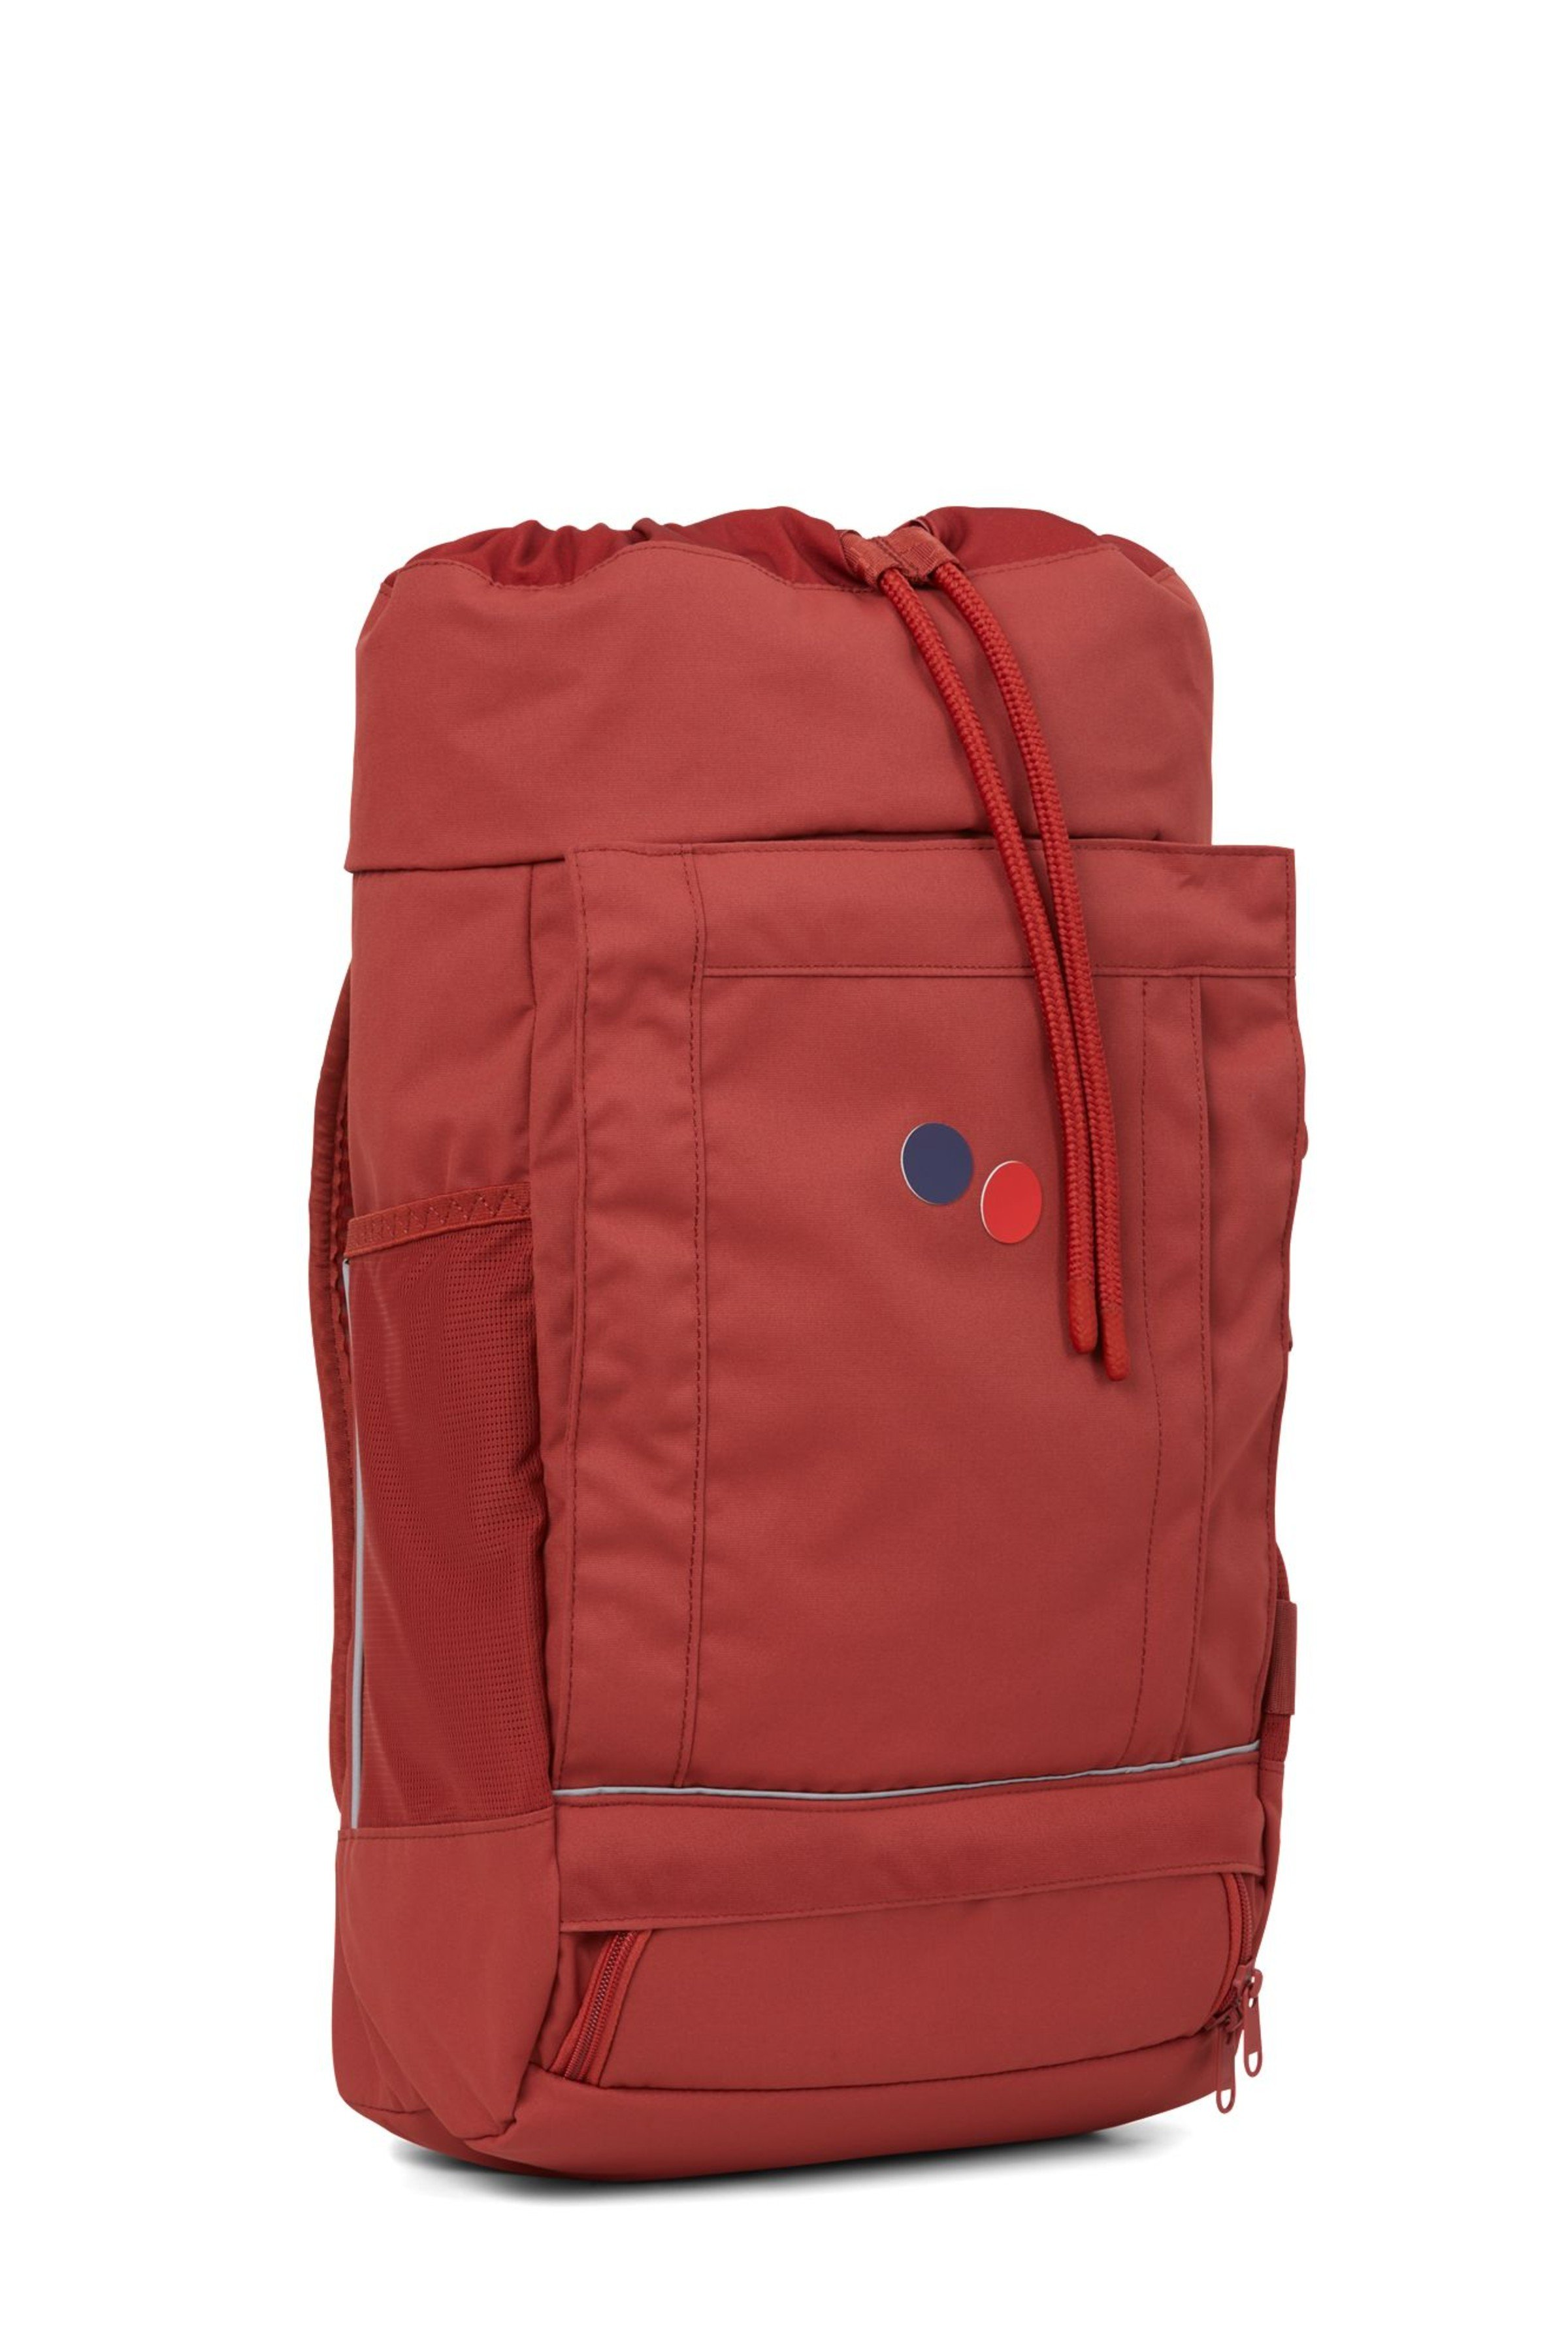 Rucksack Blok Medium Blur Red from LOVECO